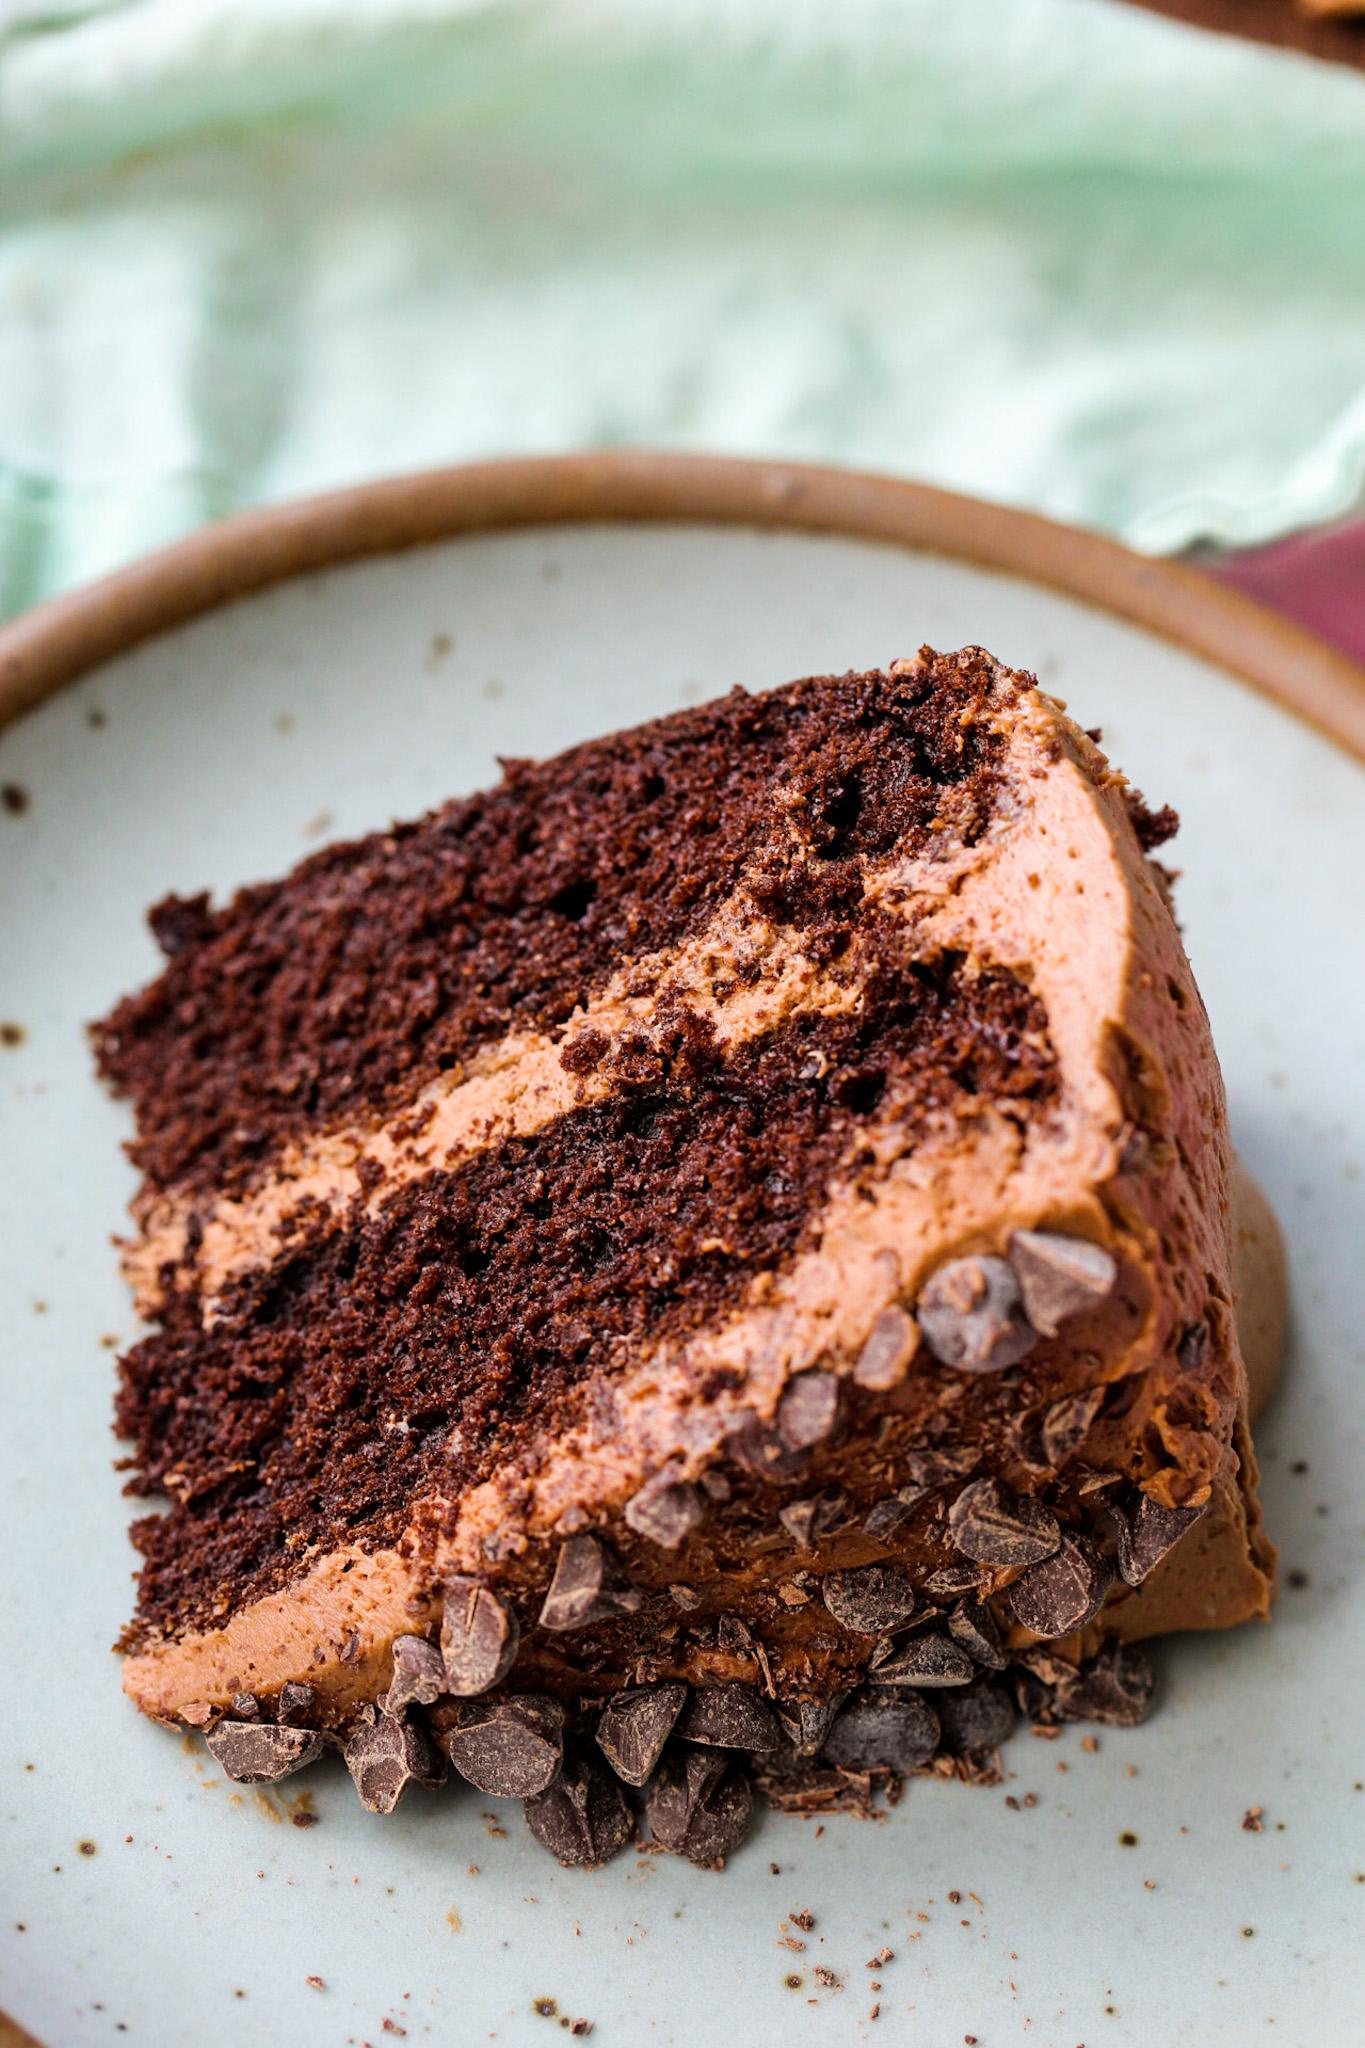 chocolate layer cake slice turquoise back